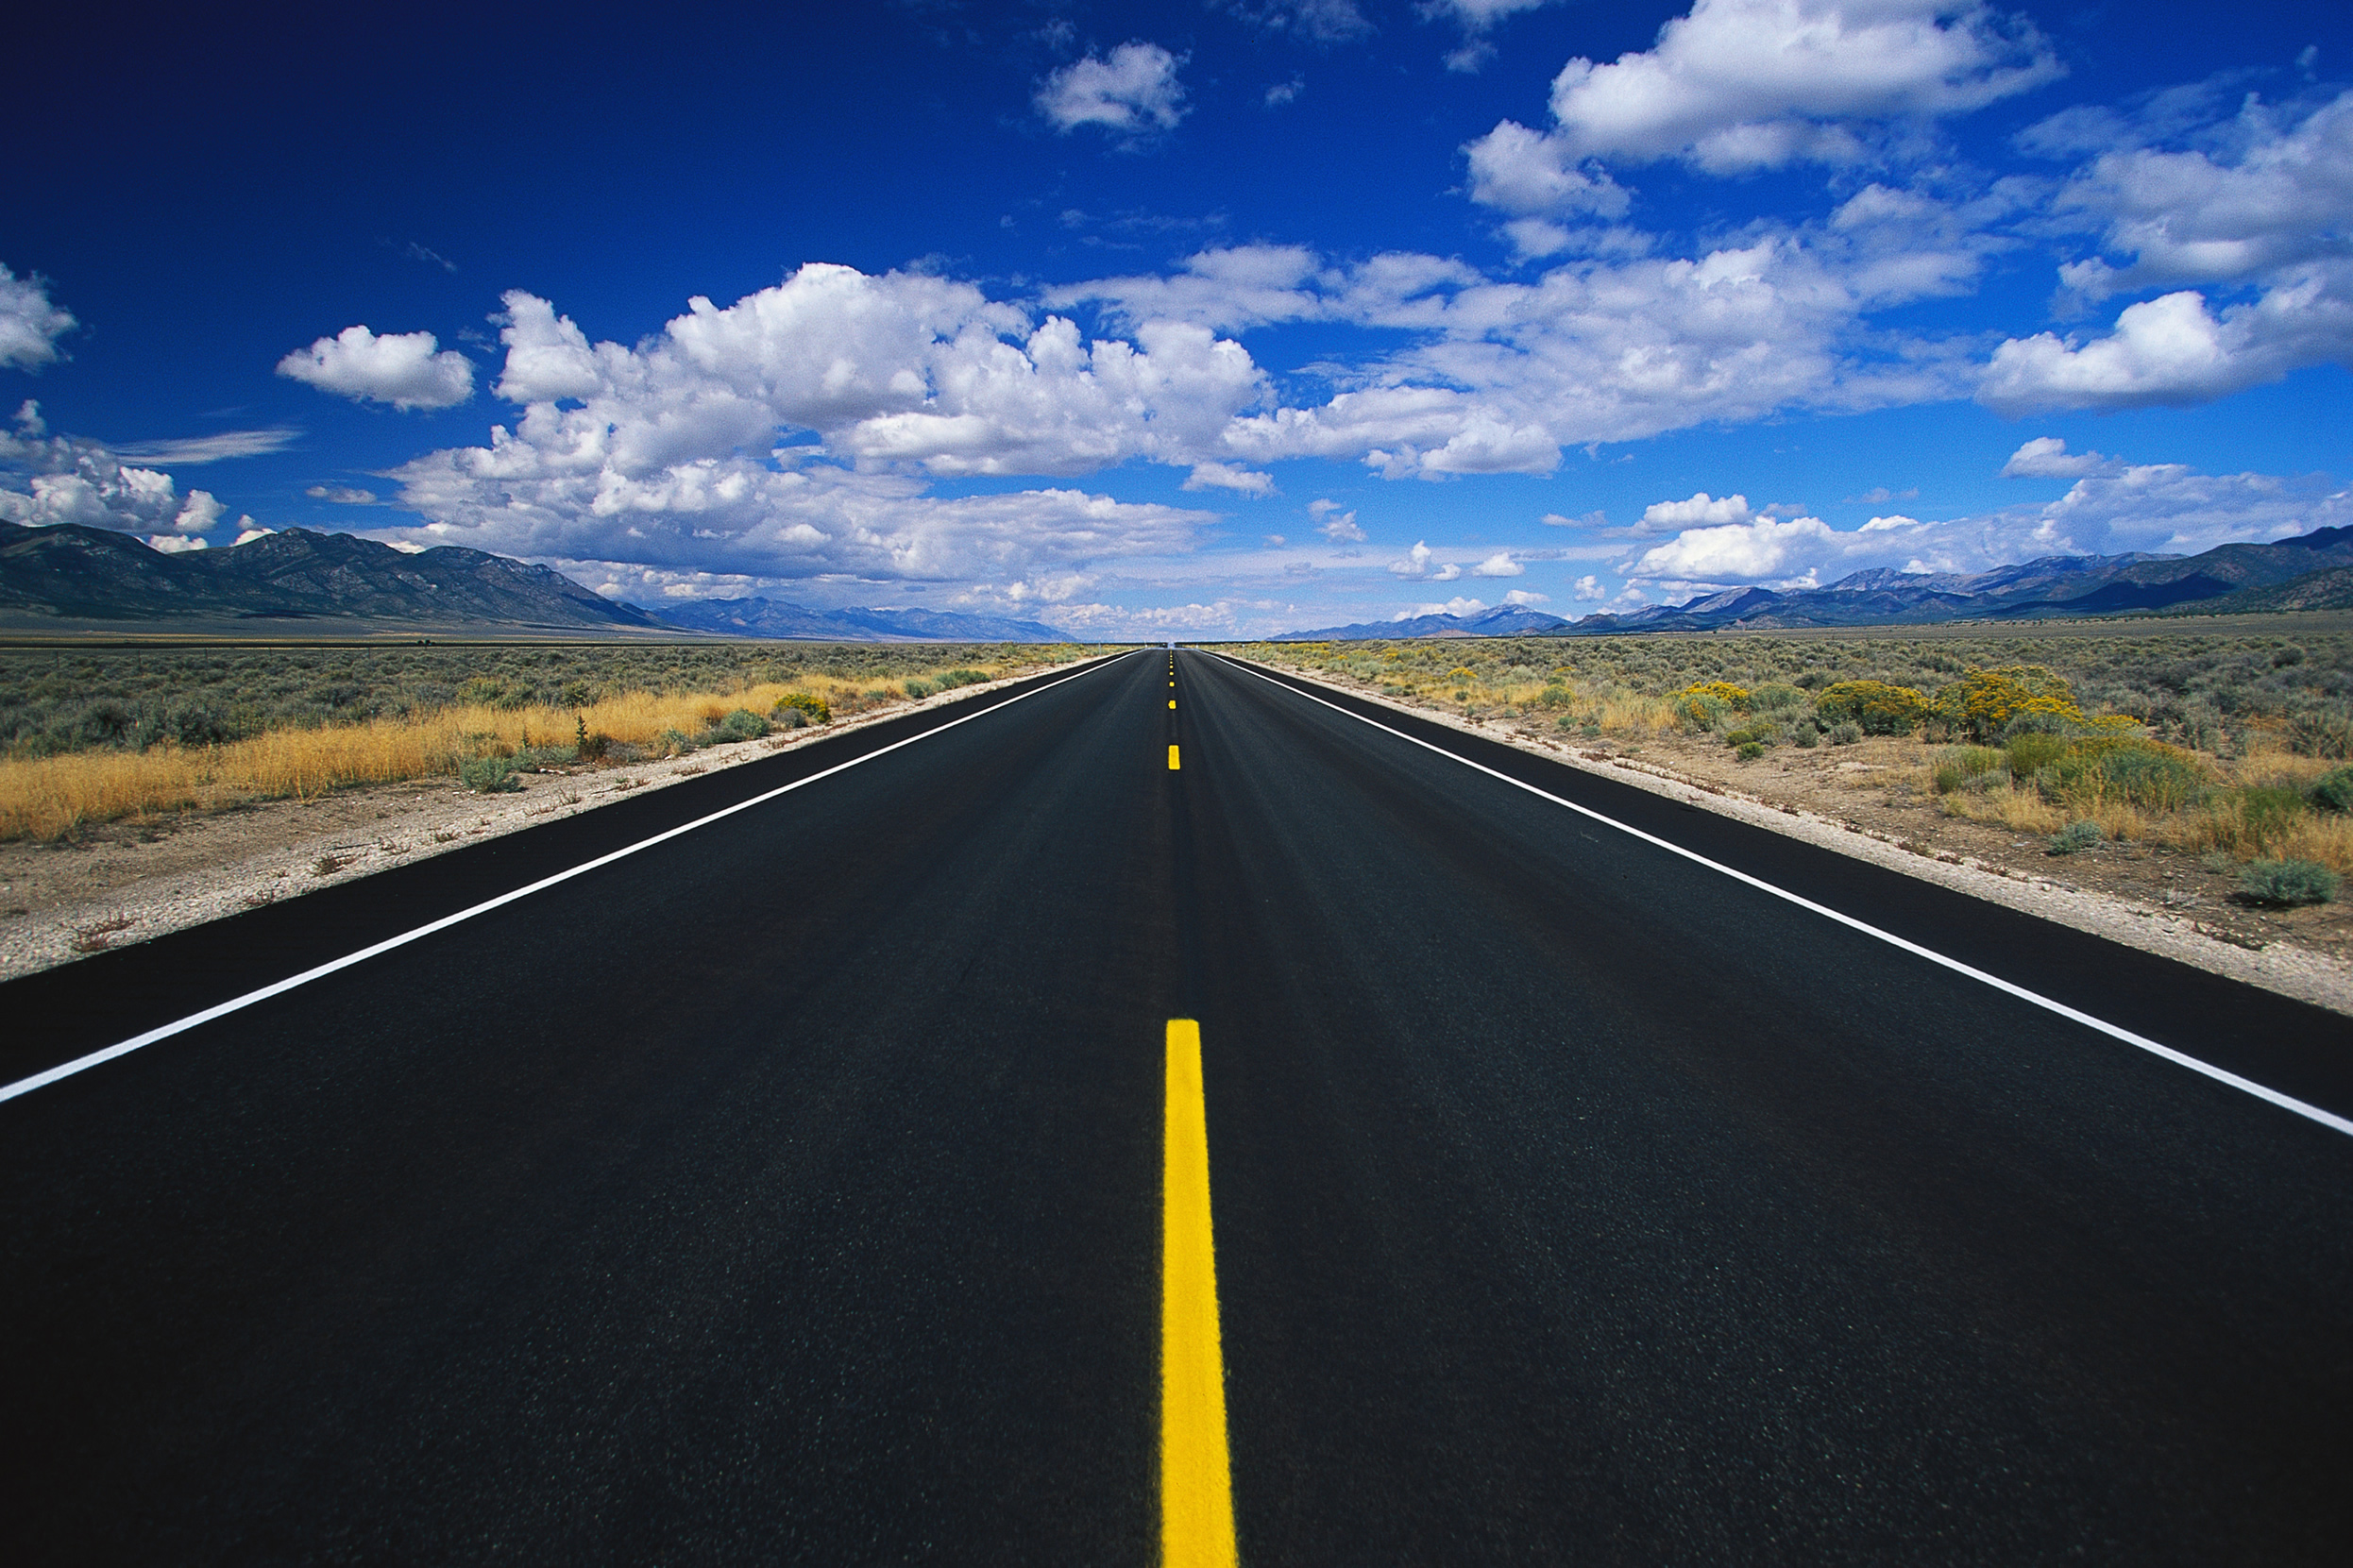 Download wallpaper: strait asphalt road, white road markings ...